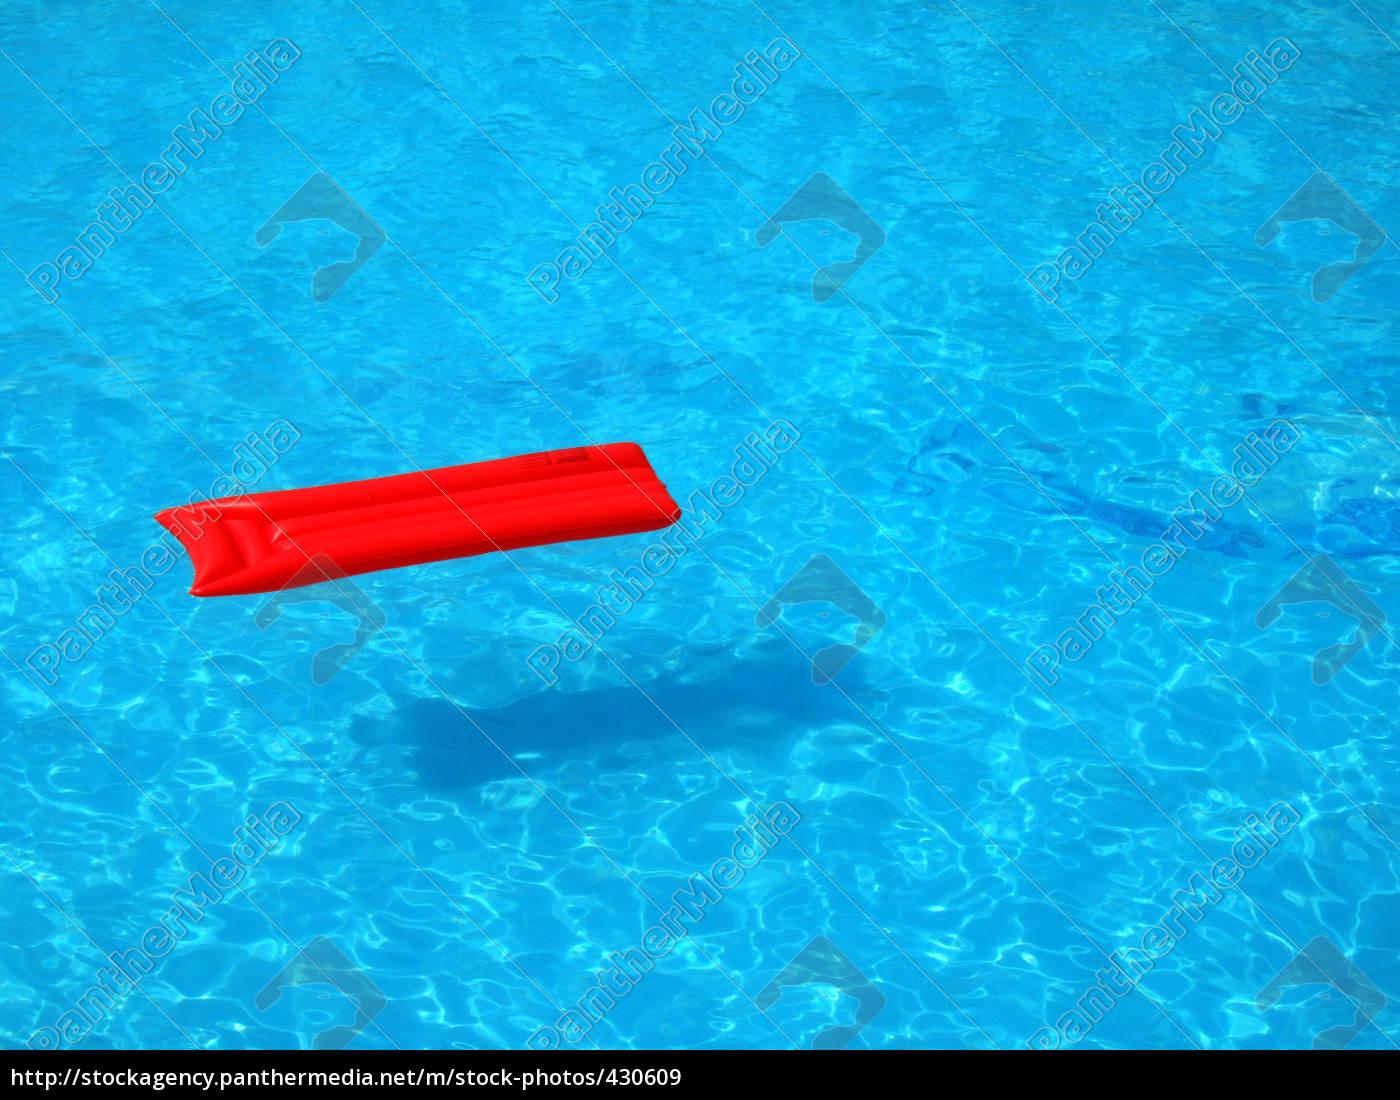 Rote Luftmatratze im Pool - Lizenzfreies Bild - #430609 ...